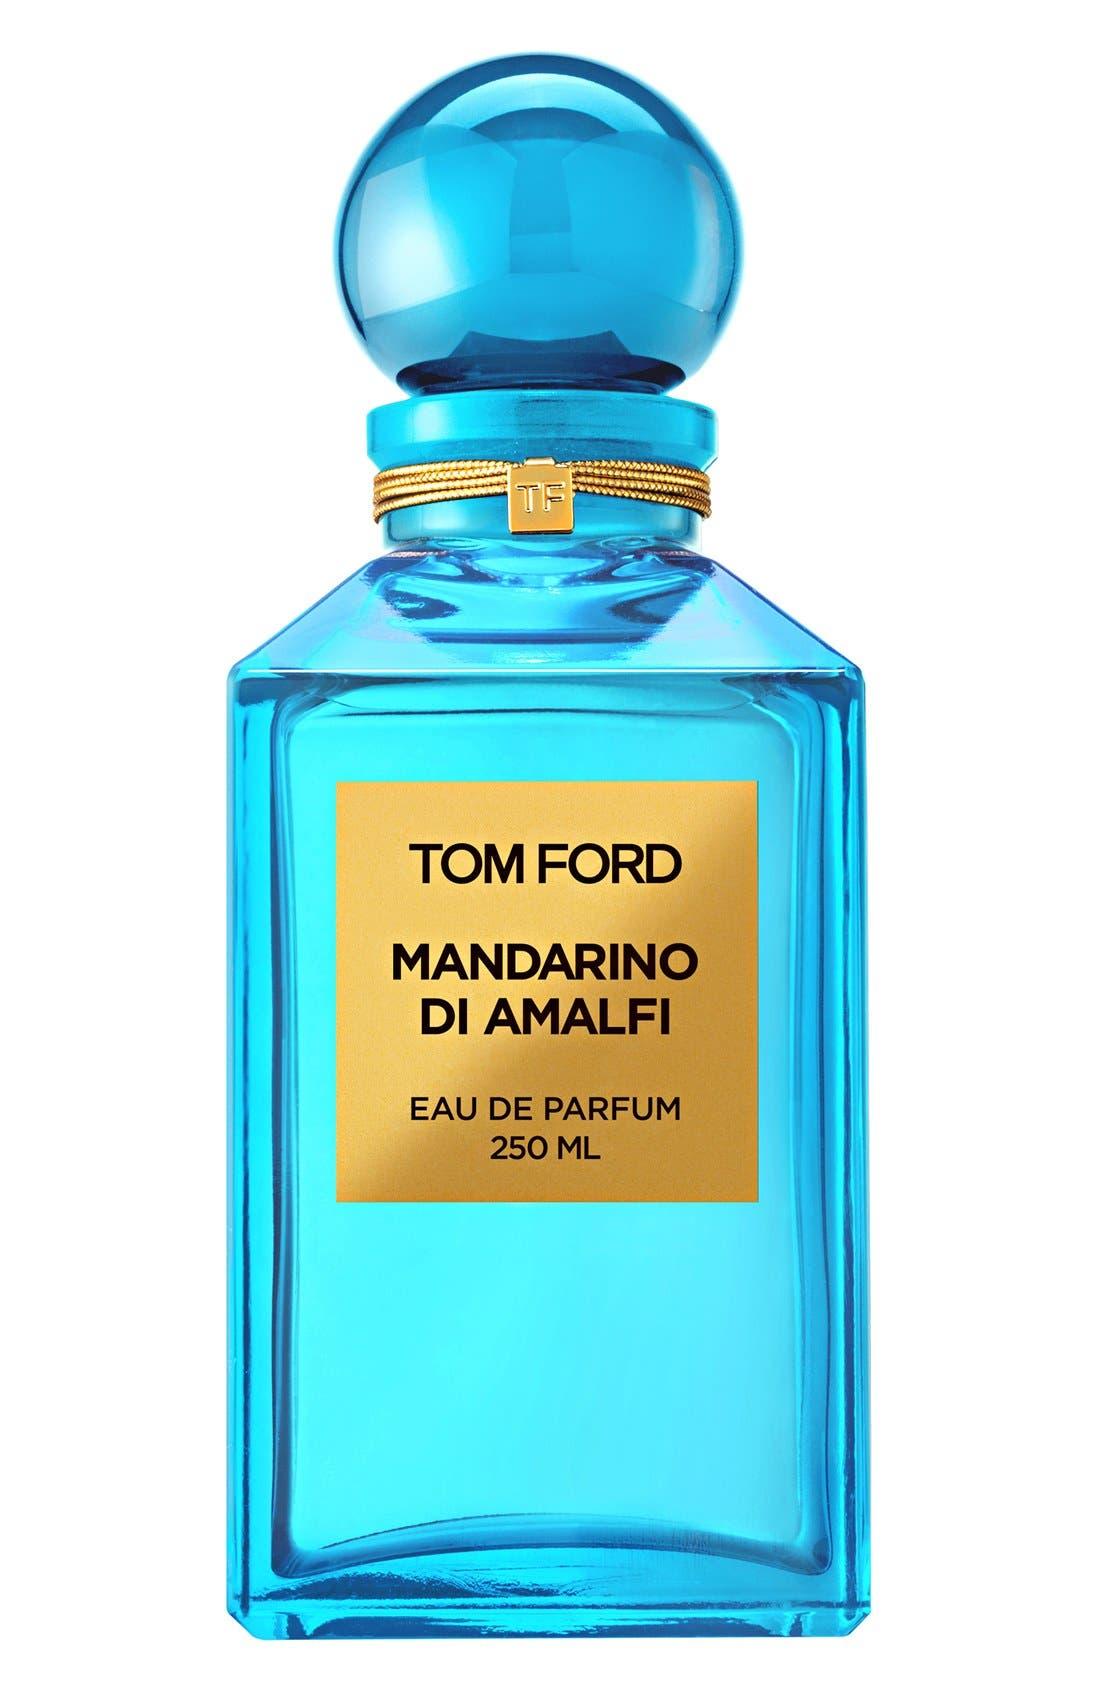 Tom Ford Private Blend Mandarino di Amalfi Eau de Parfum Decanter